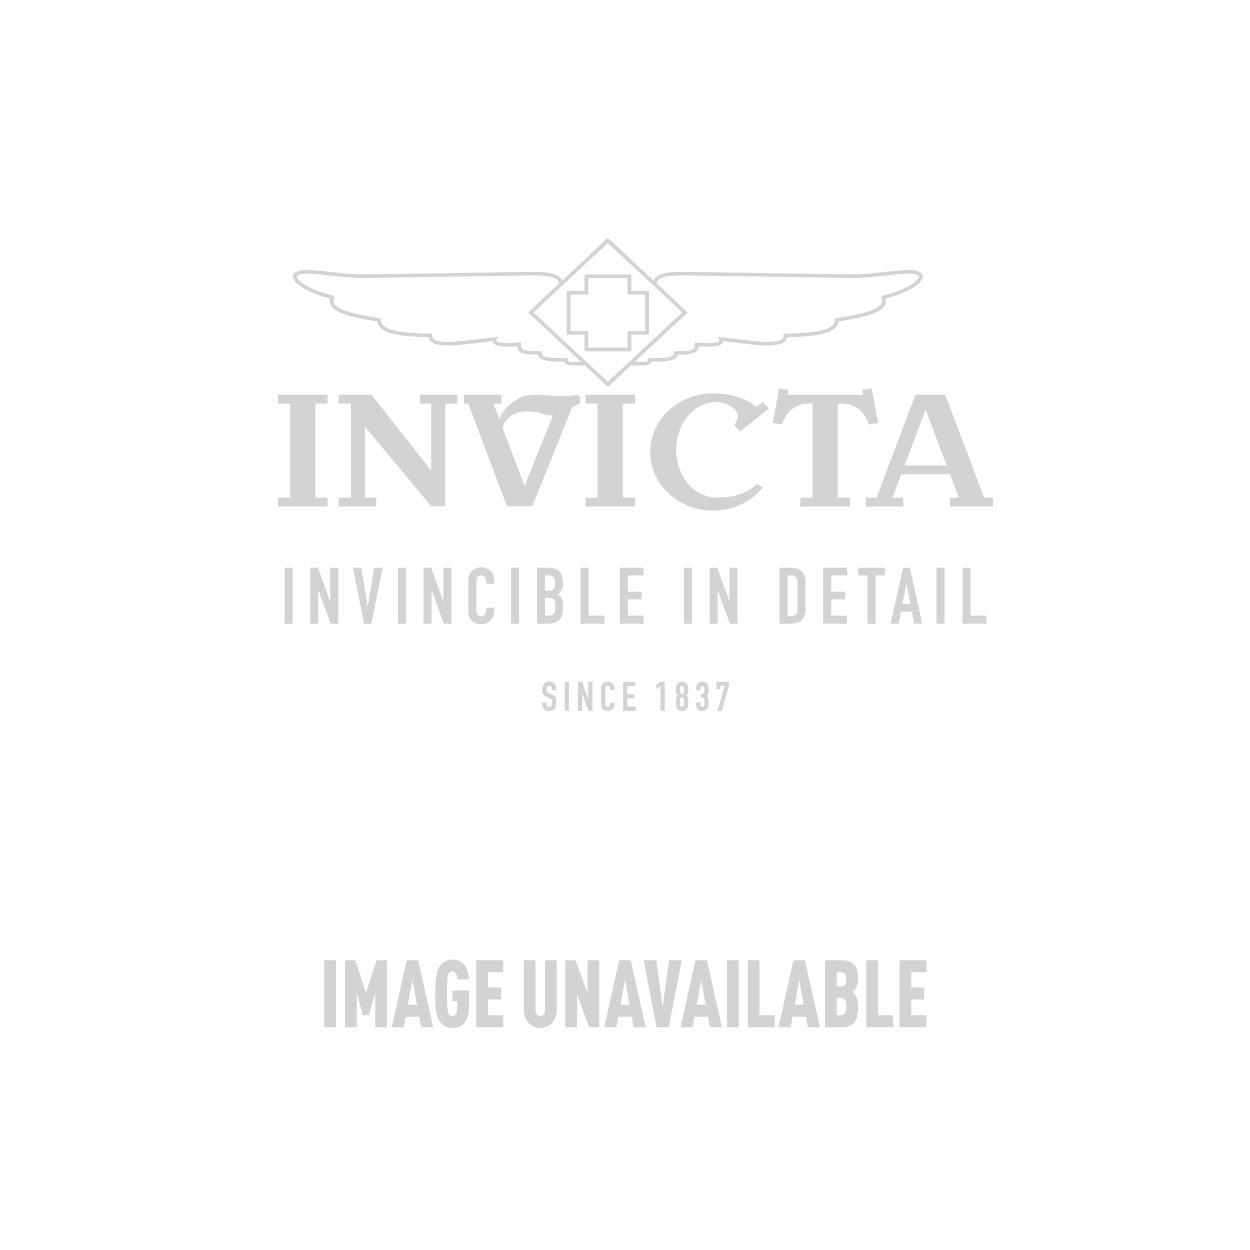 Invicta Subaqua Swiss Made Quartz Watch - Gold, Black case with Black tone Polyurethane band - Model 0913